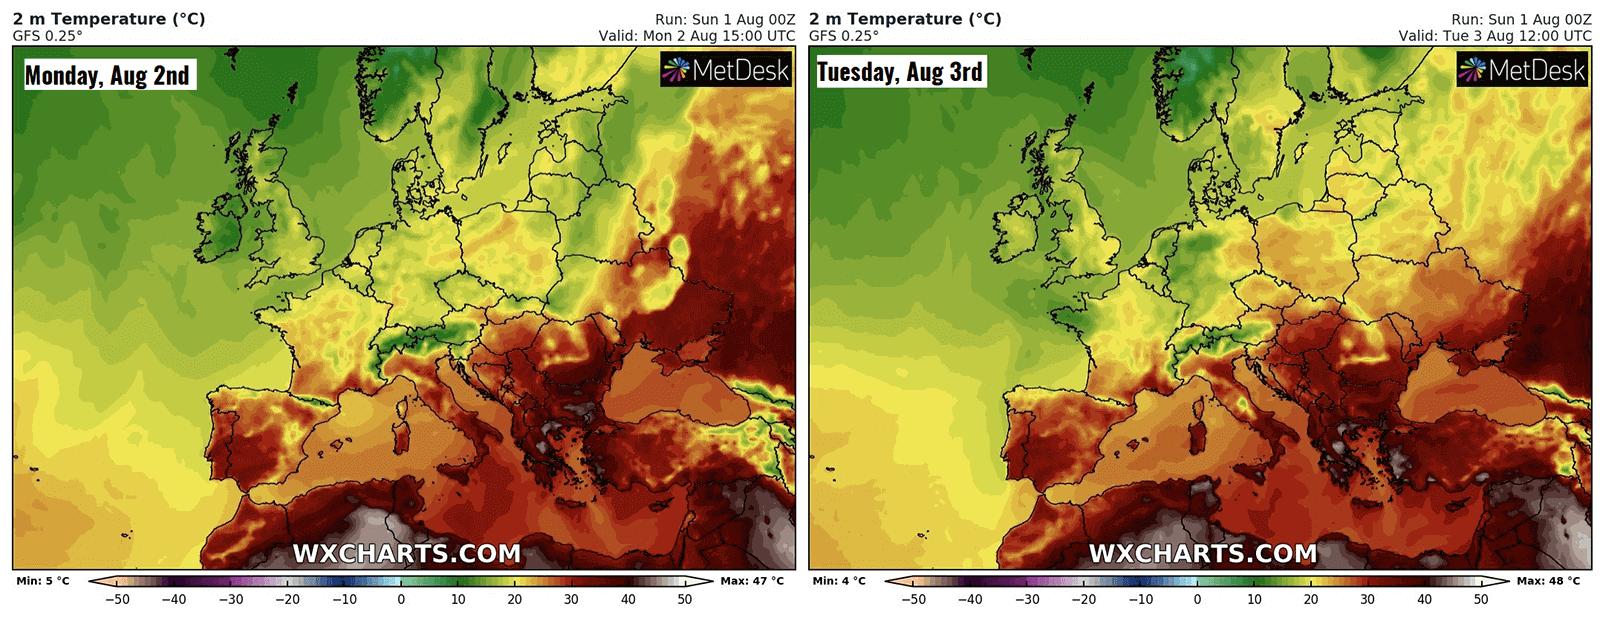 extreme-record-heatwave-greece-2m-temperature